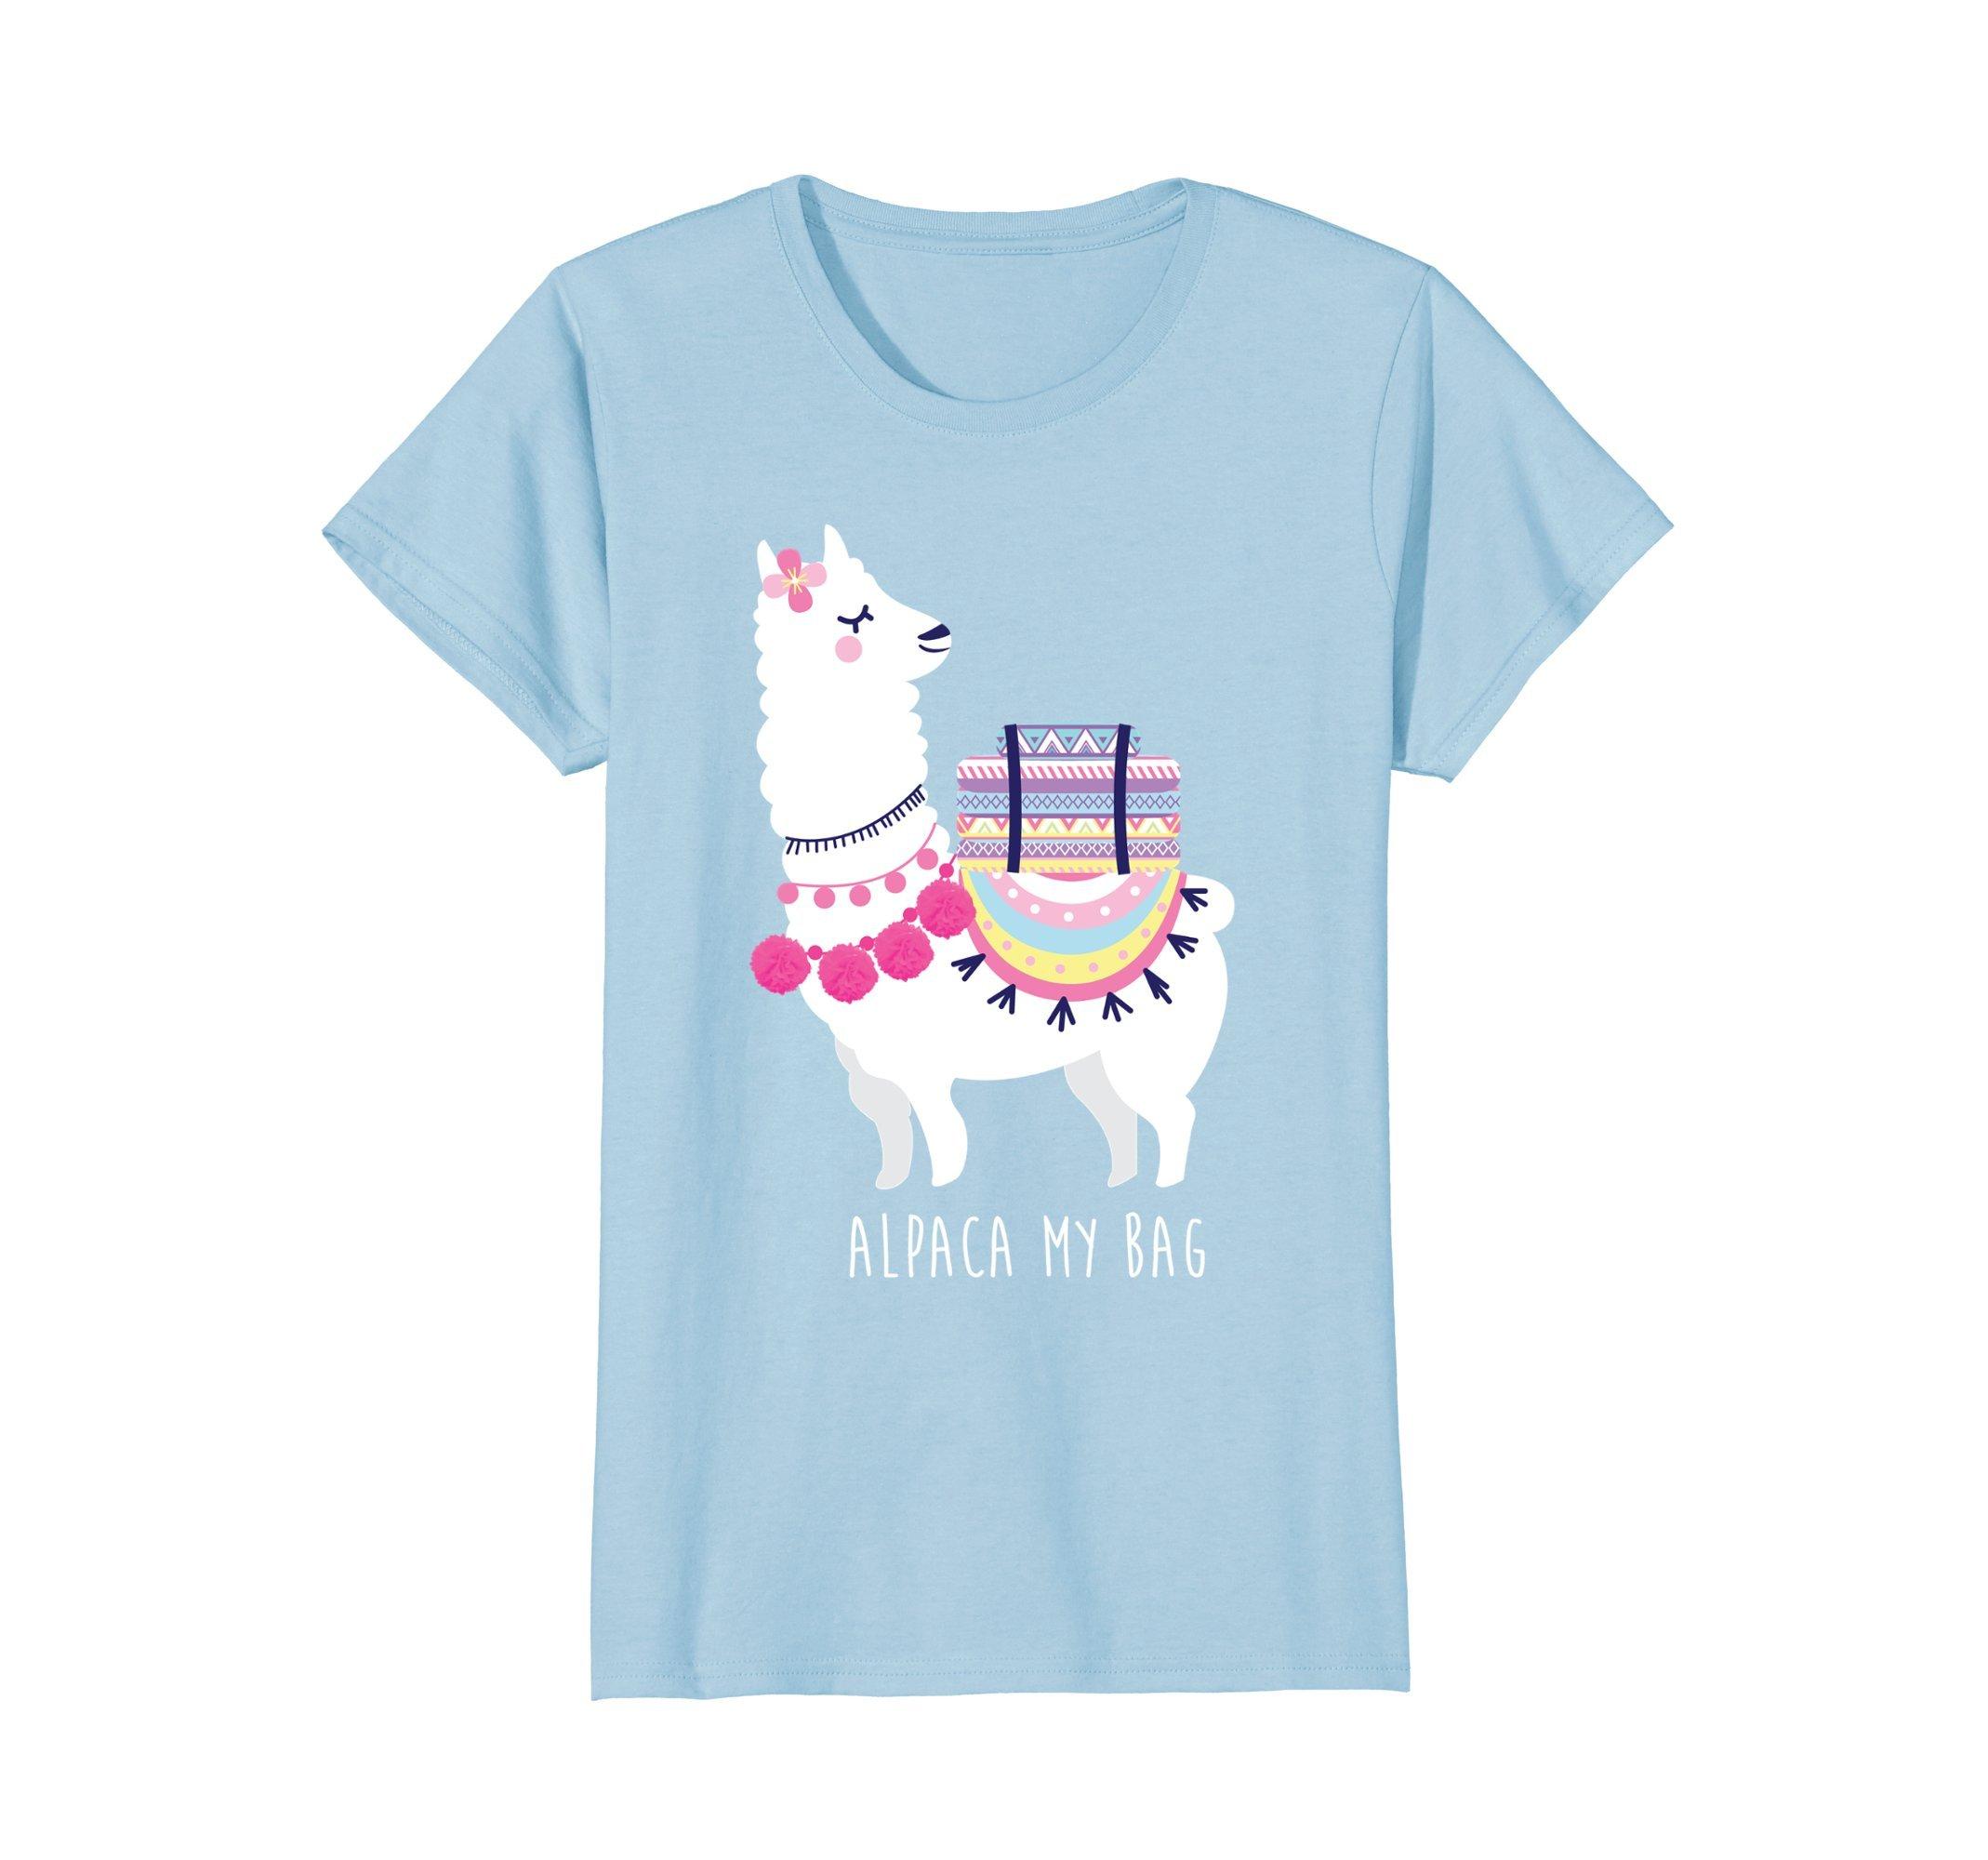 Alpaca My Bag Cute Humorous Girl's T-Shirt